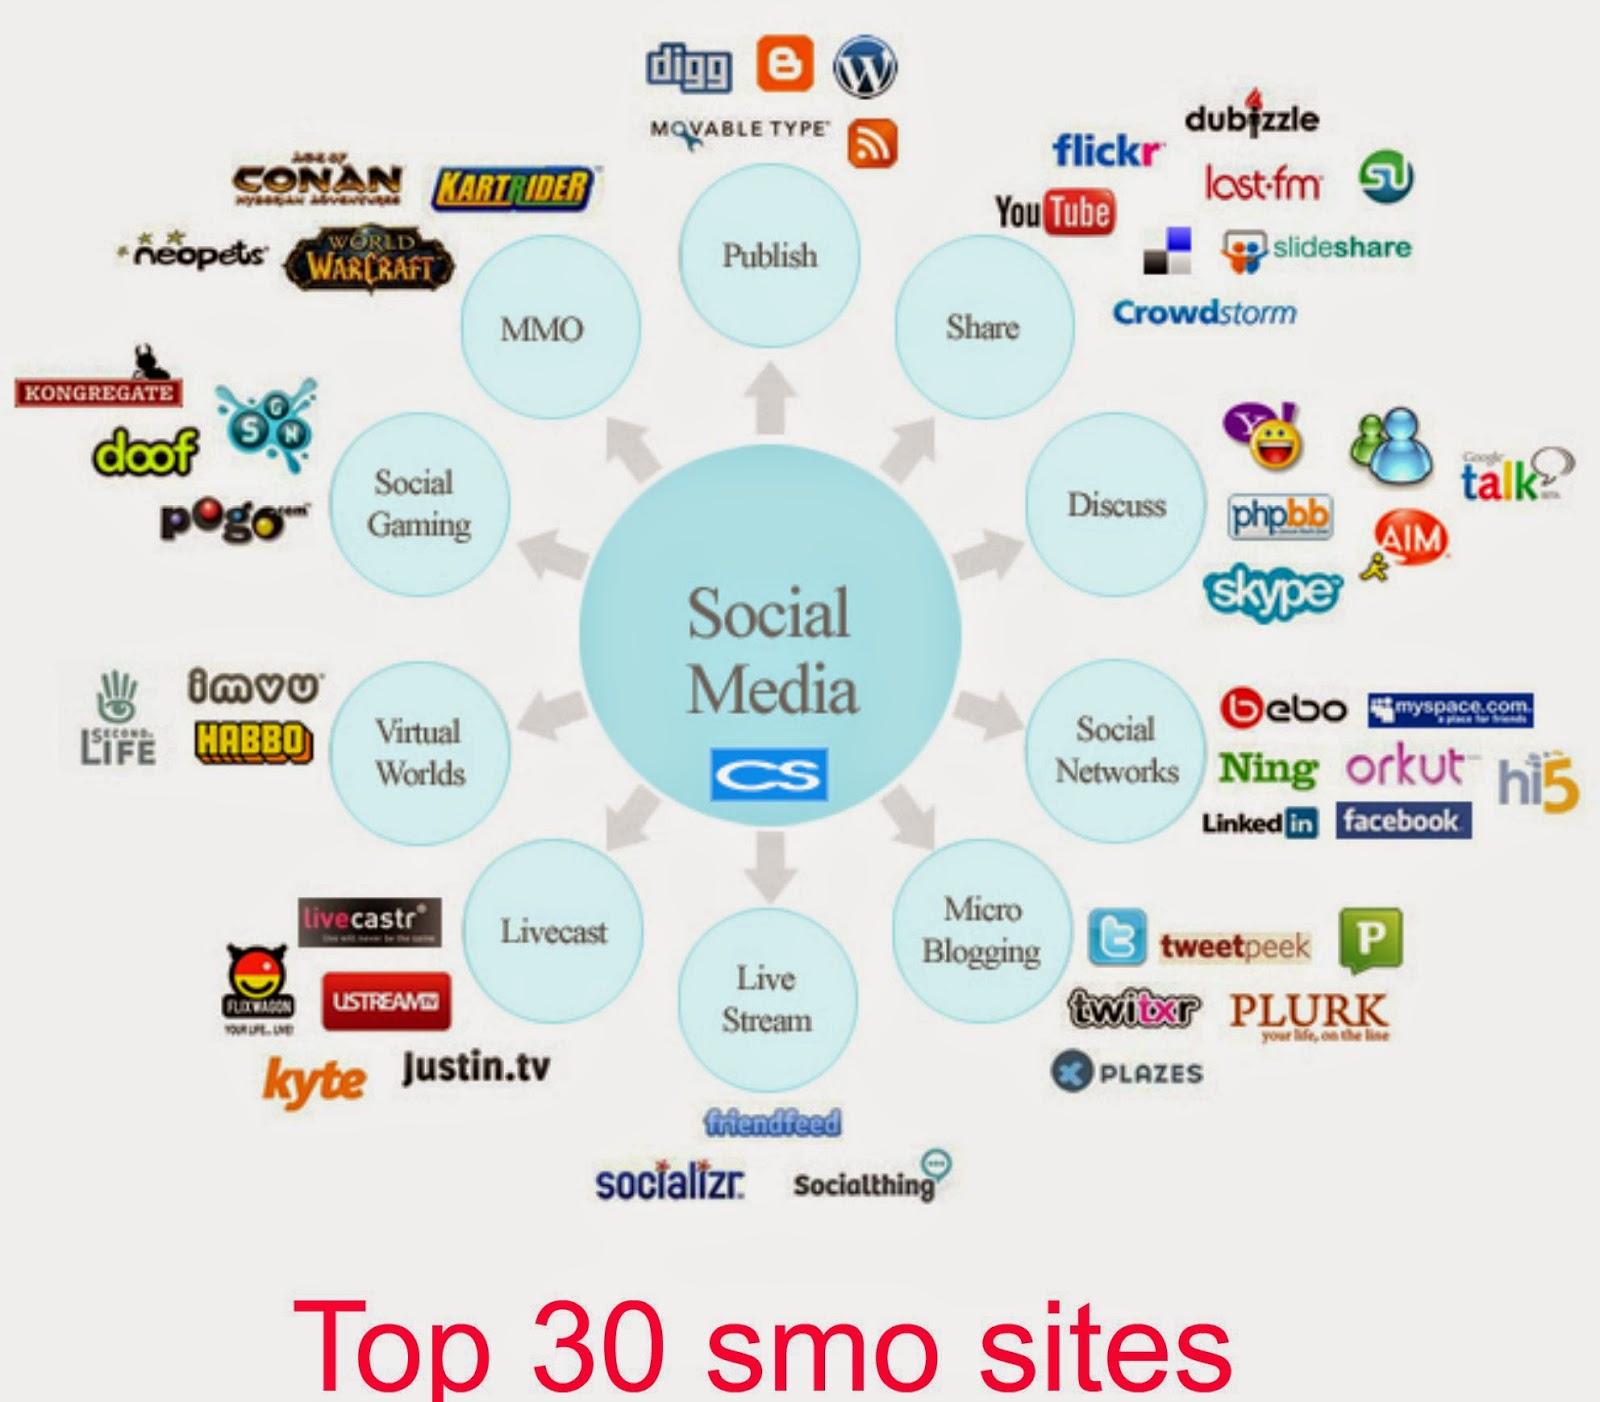 top 30 smo sites list 2015